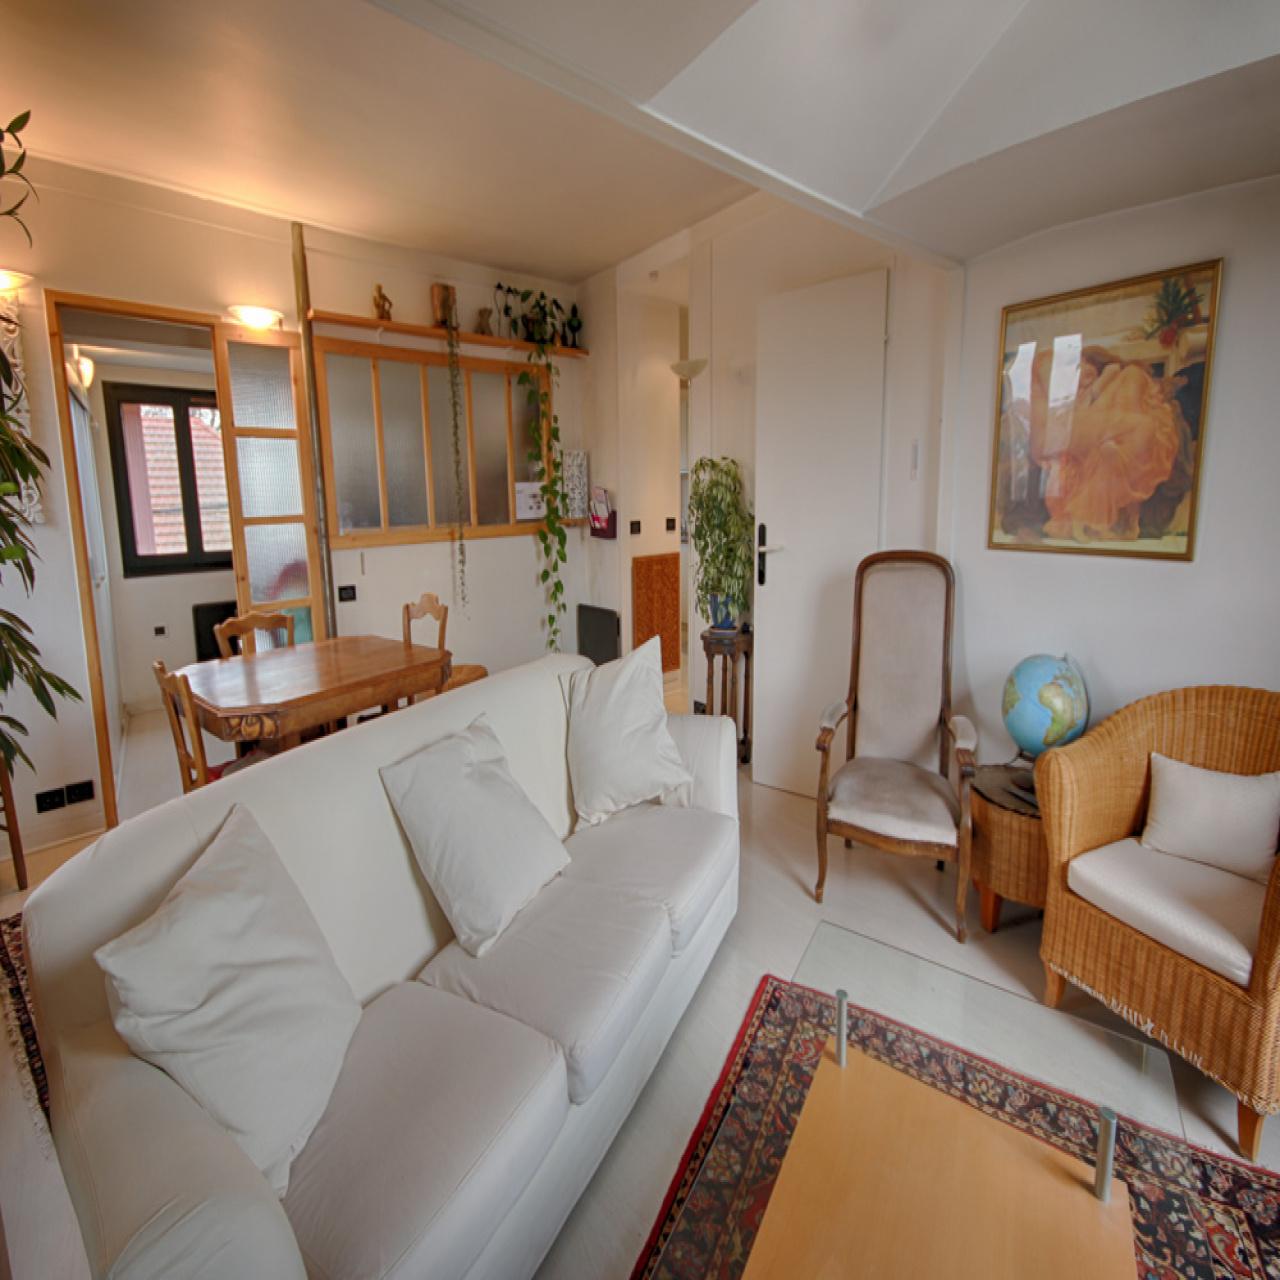 Image_1, Appartement, Cran-Gevrier, ref :FI3119